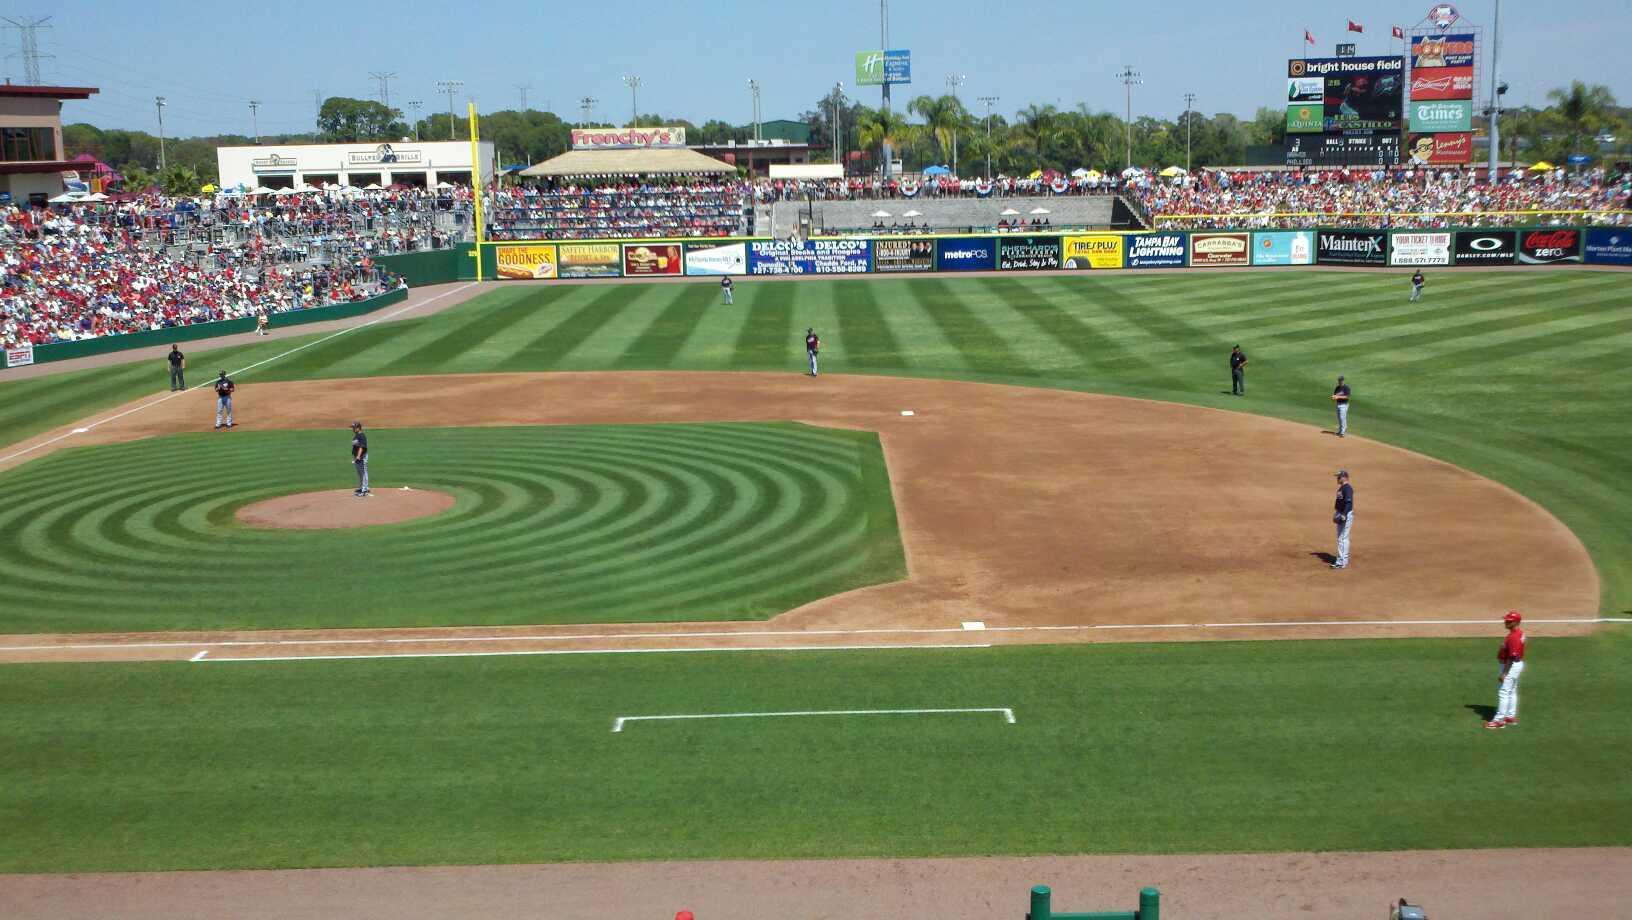 BayCare Ballpark Section 203 Row 1 Seat 10